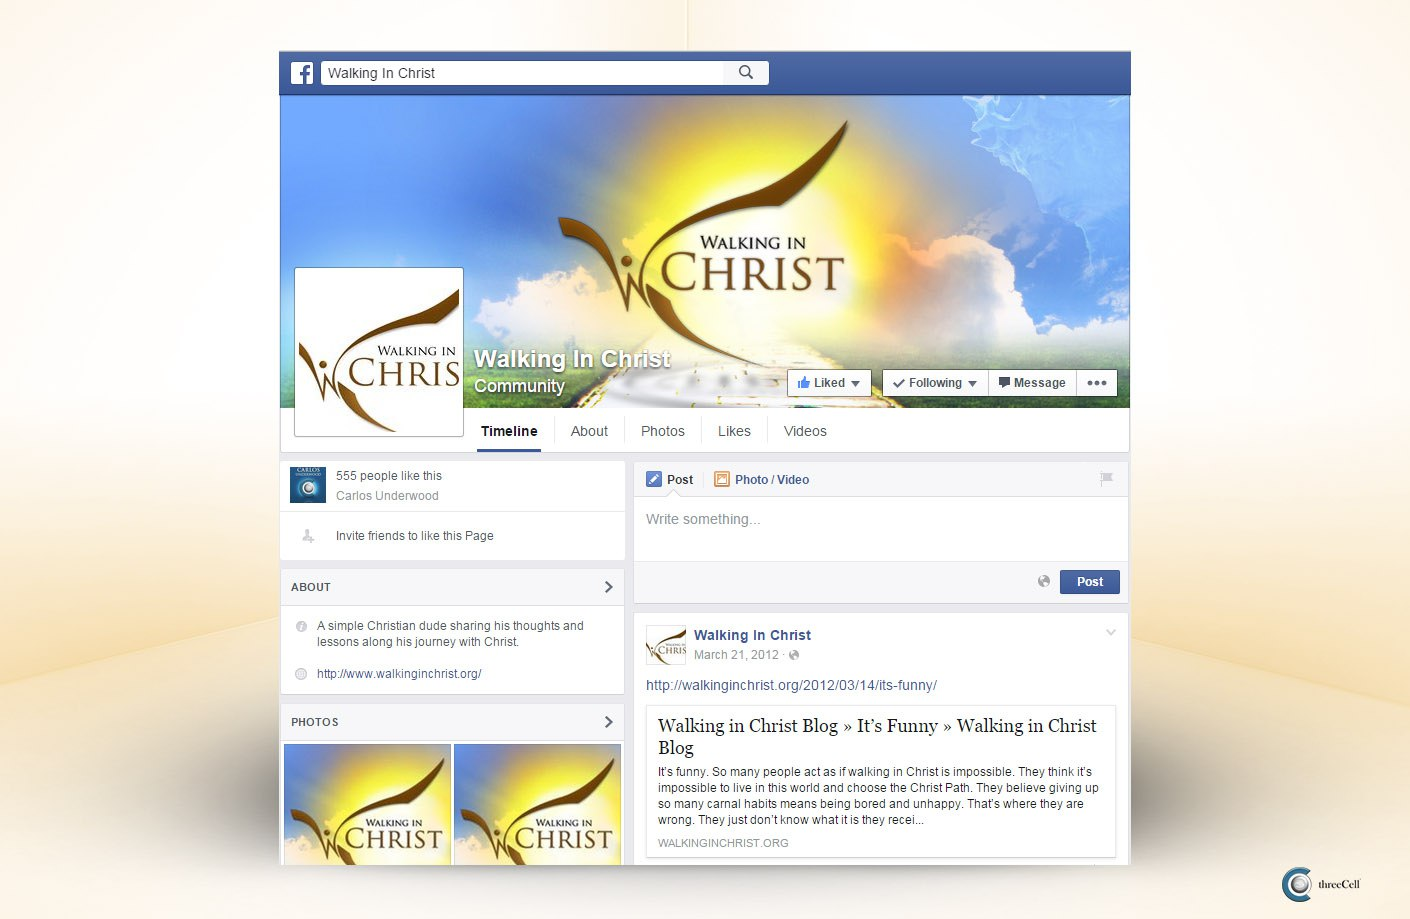 Walking in Christ - Facebook Social Media Design